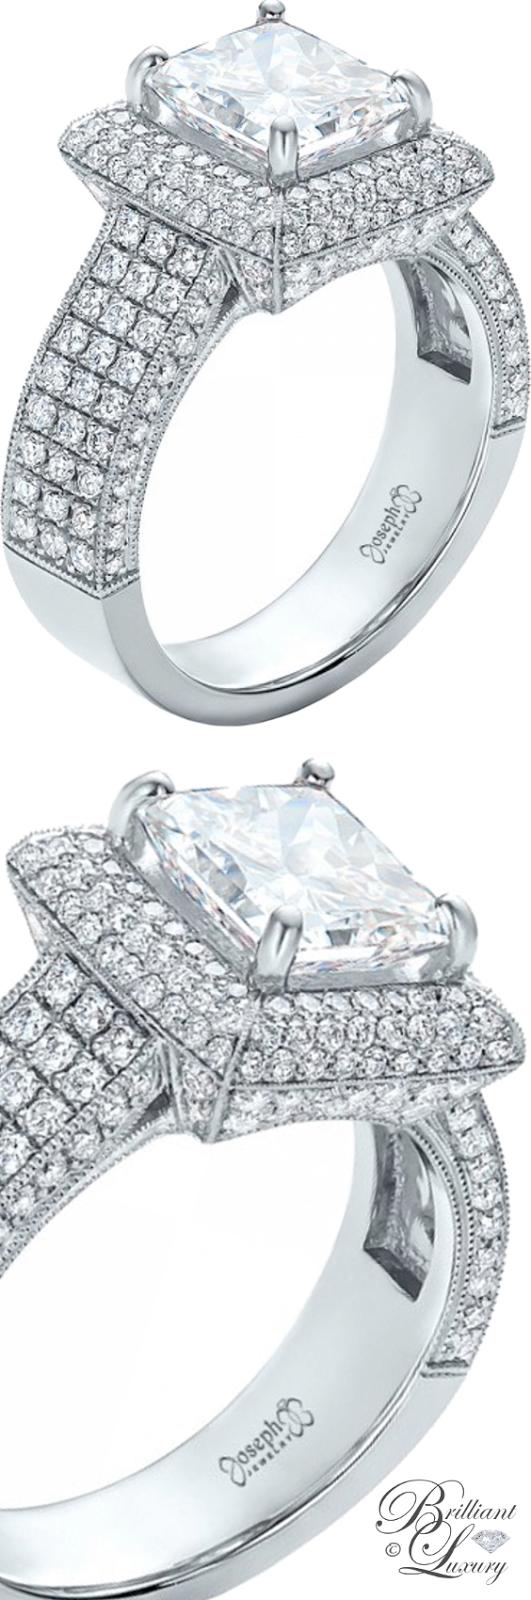 Brilliant Luxury ♦ Custom Micro-Pave Halo Diamond Engagement Ring